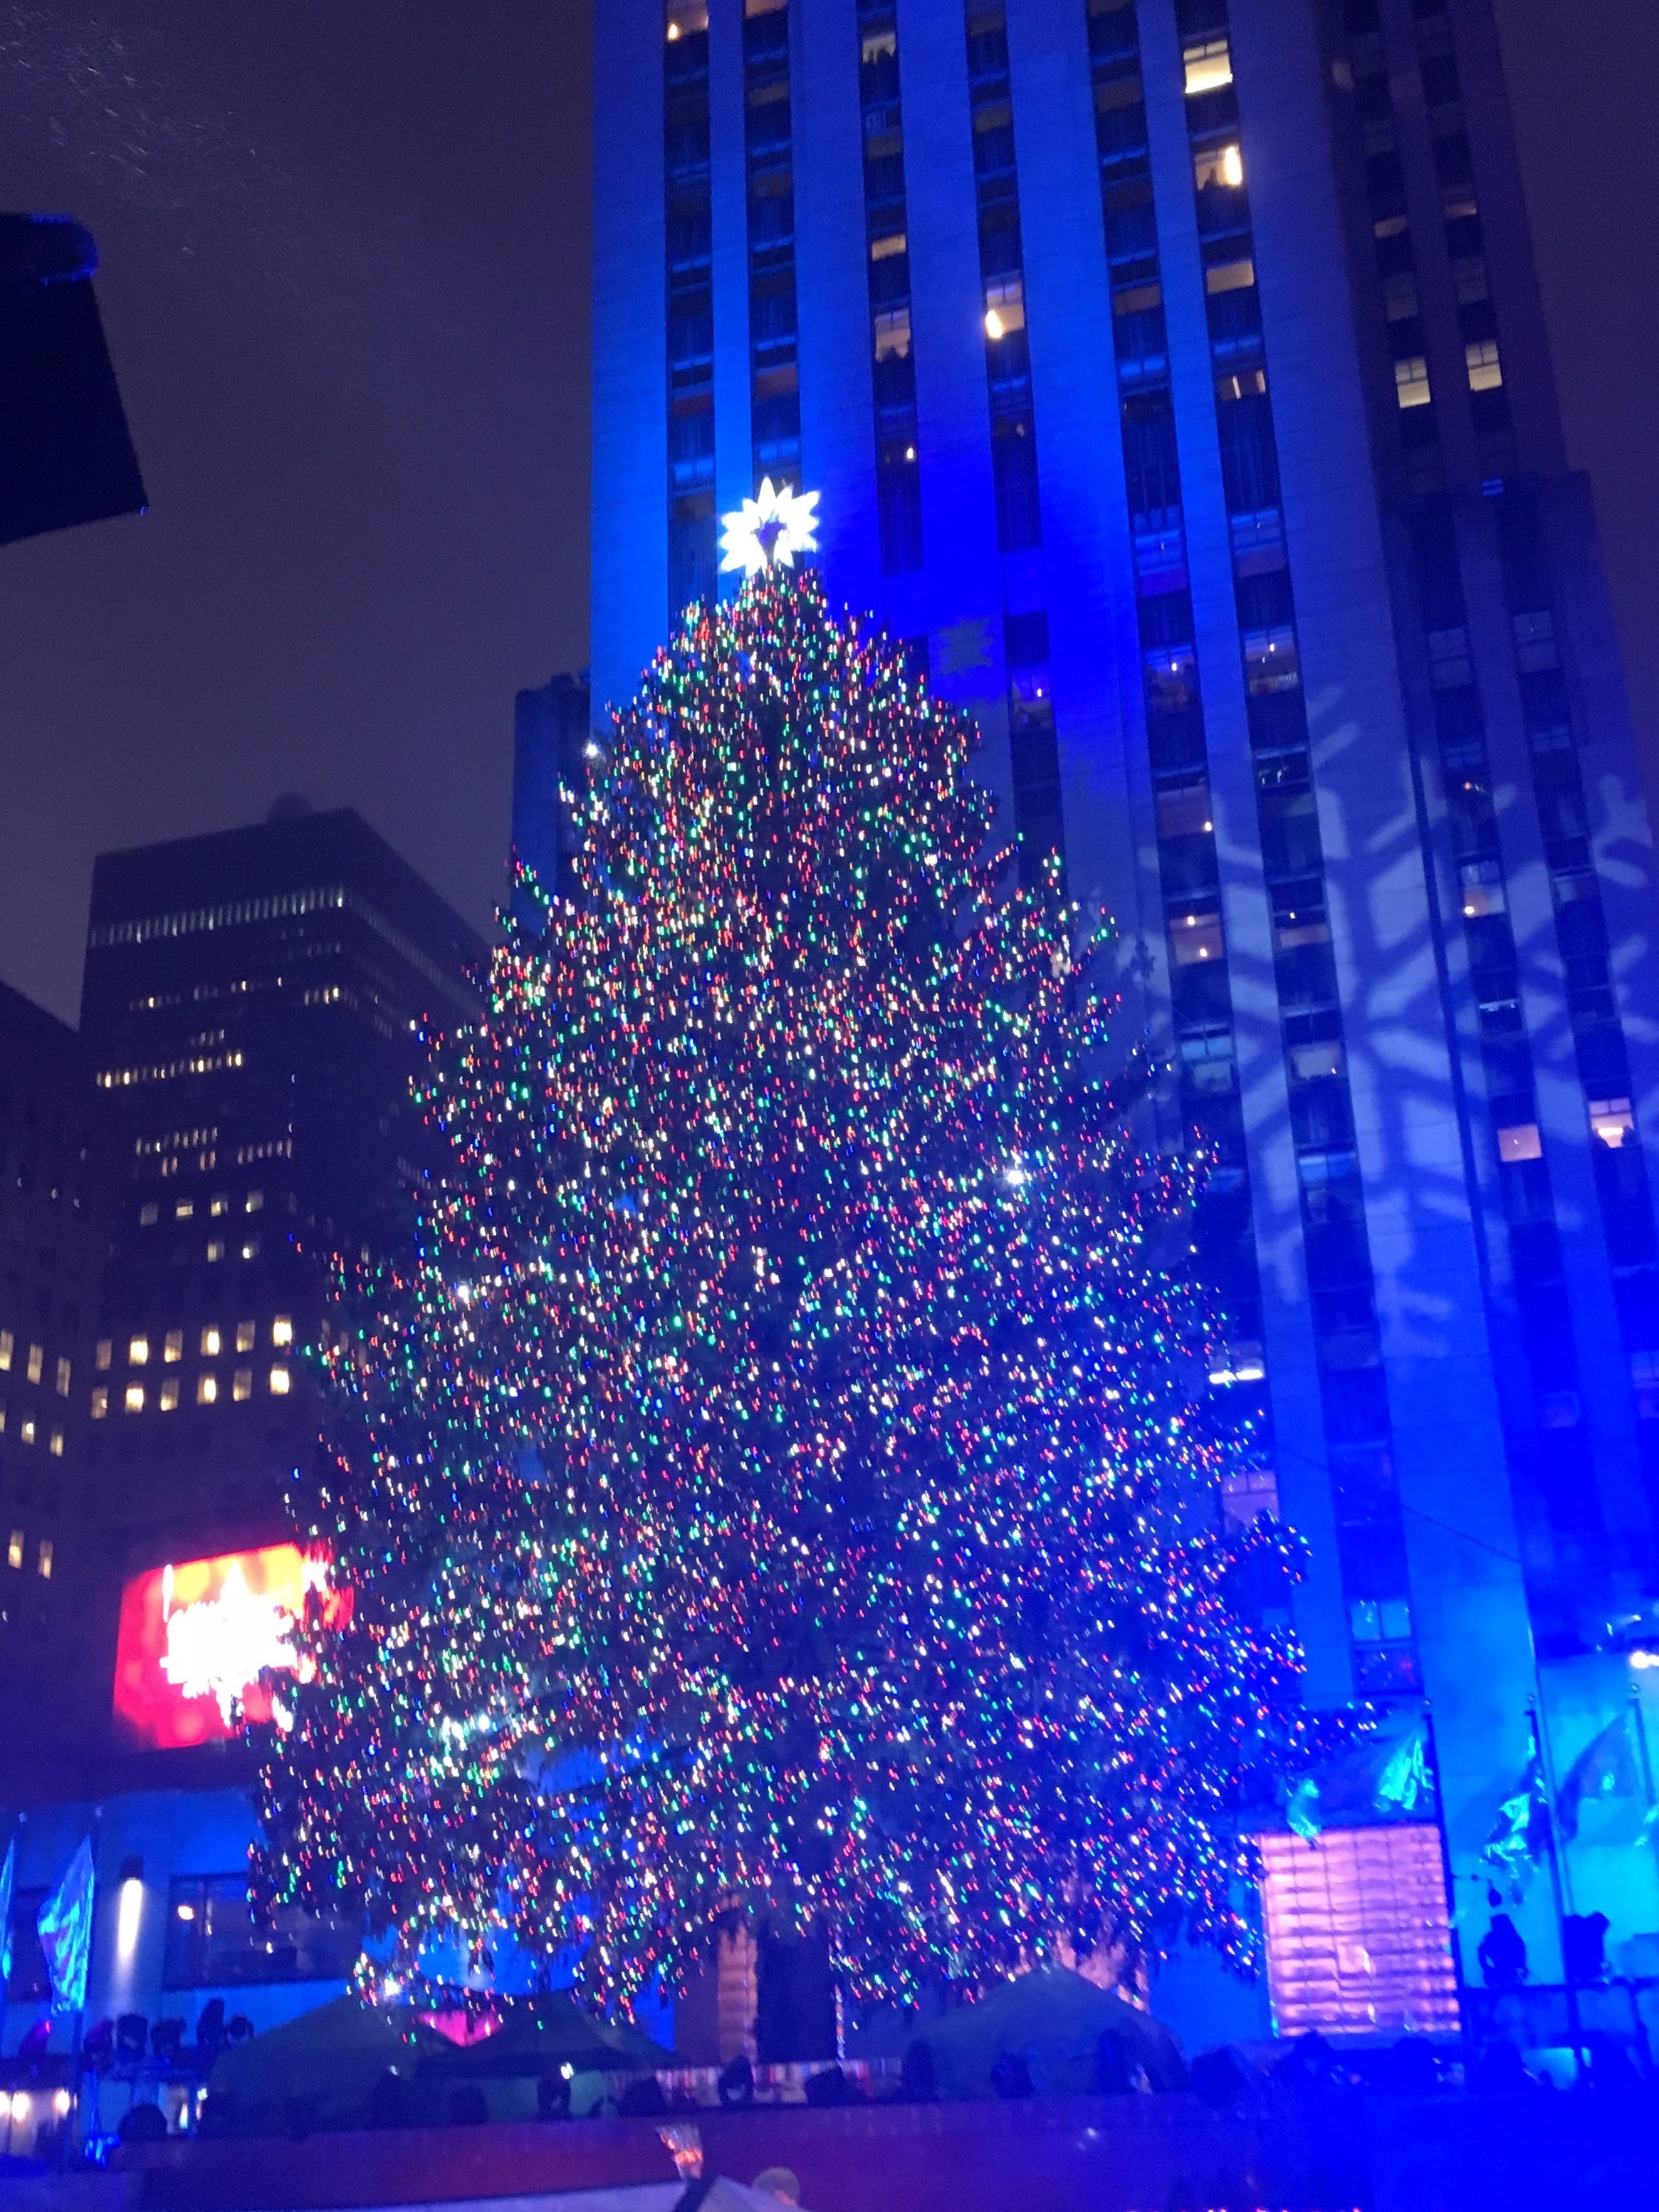 The Rockefeller Center Christmas Tree Lights Up